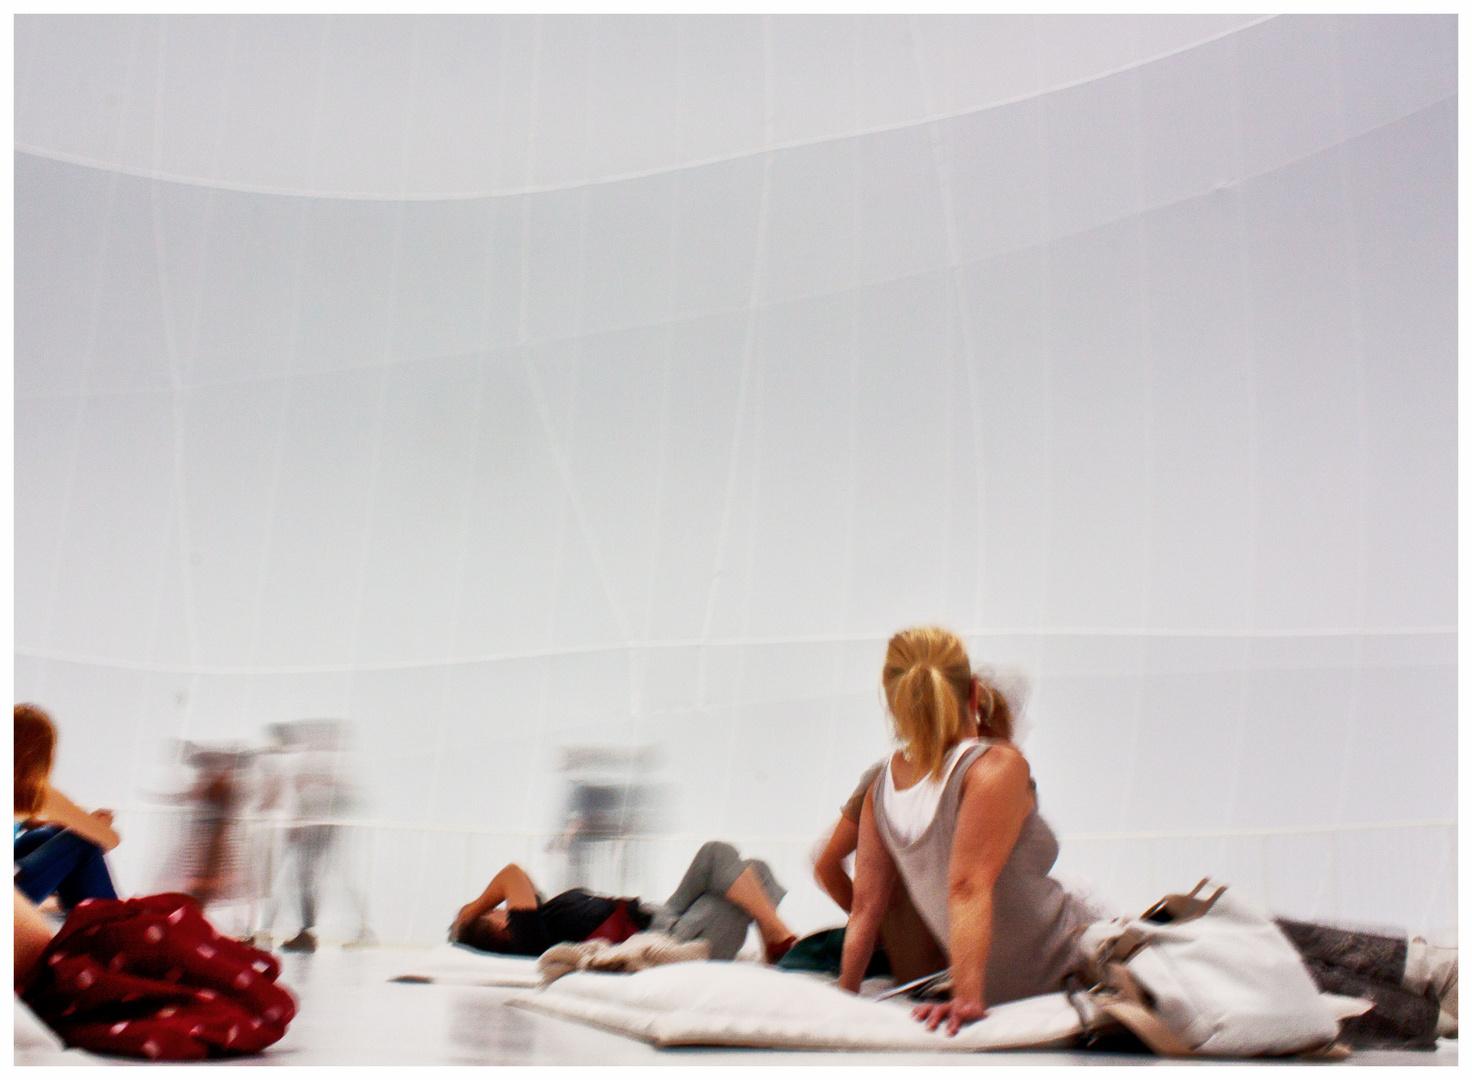 Kunstobjekt.4: Meditation im Big Air Package